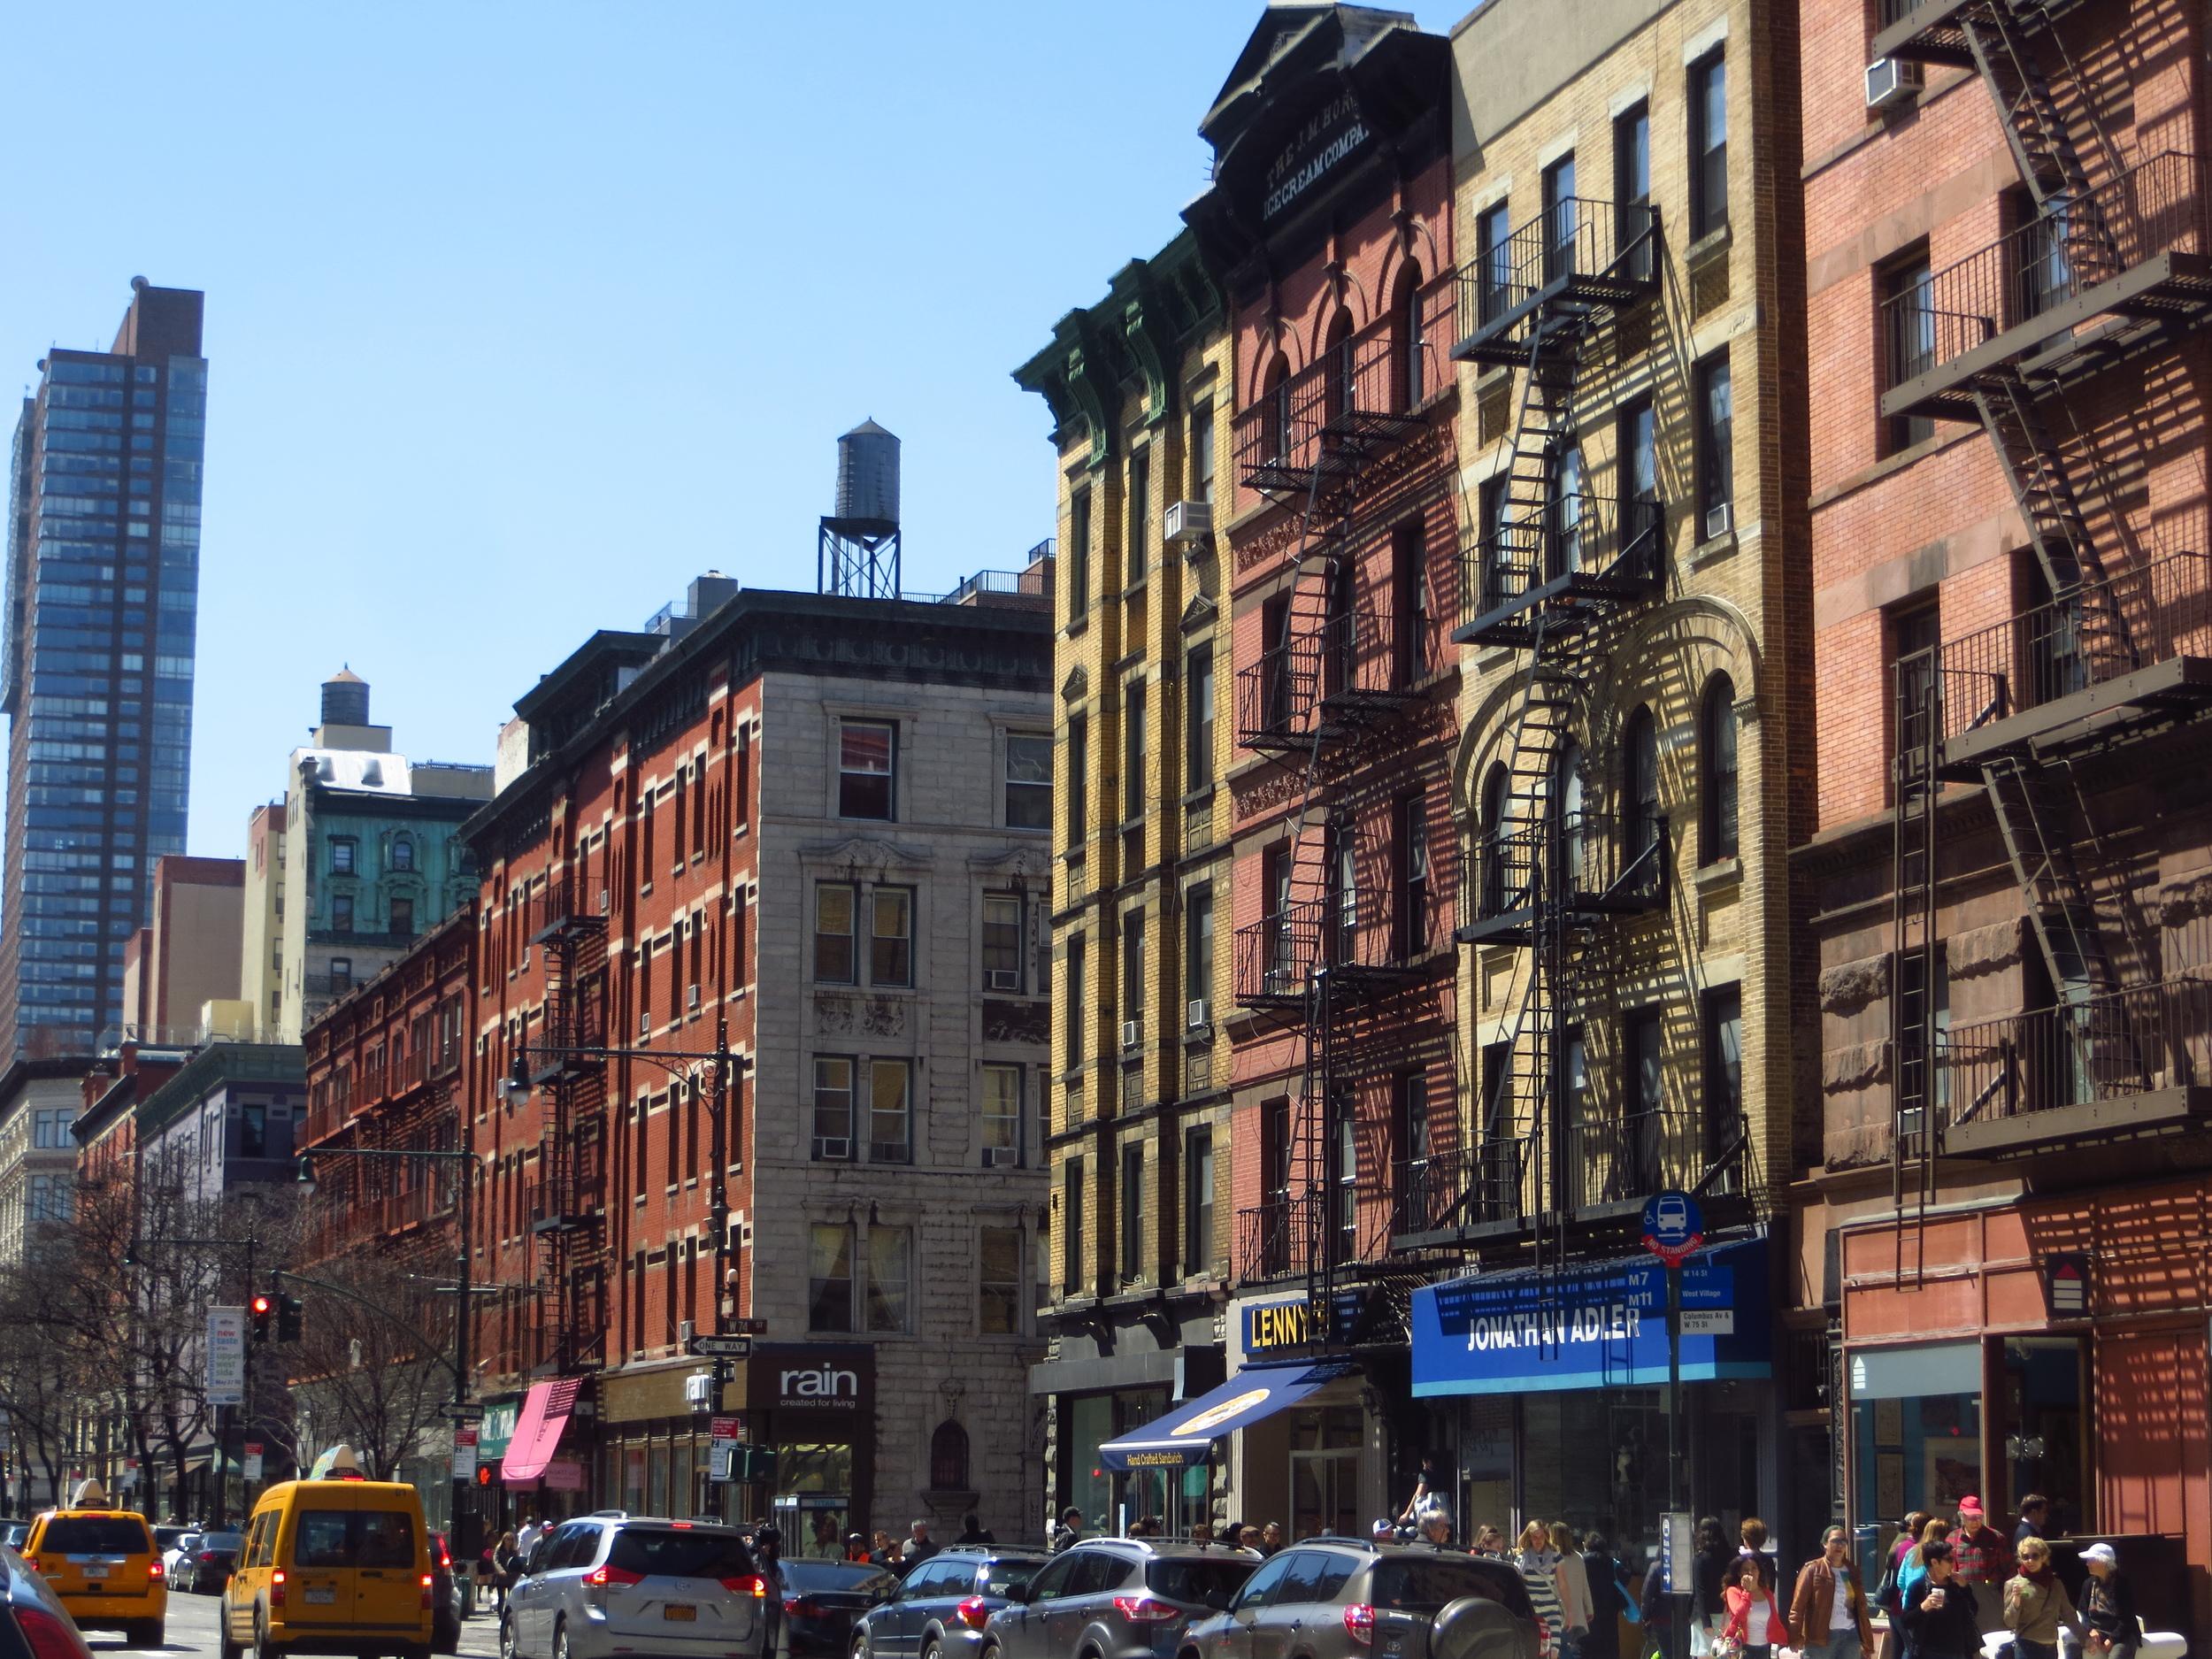 Columbus Ave. buildings